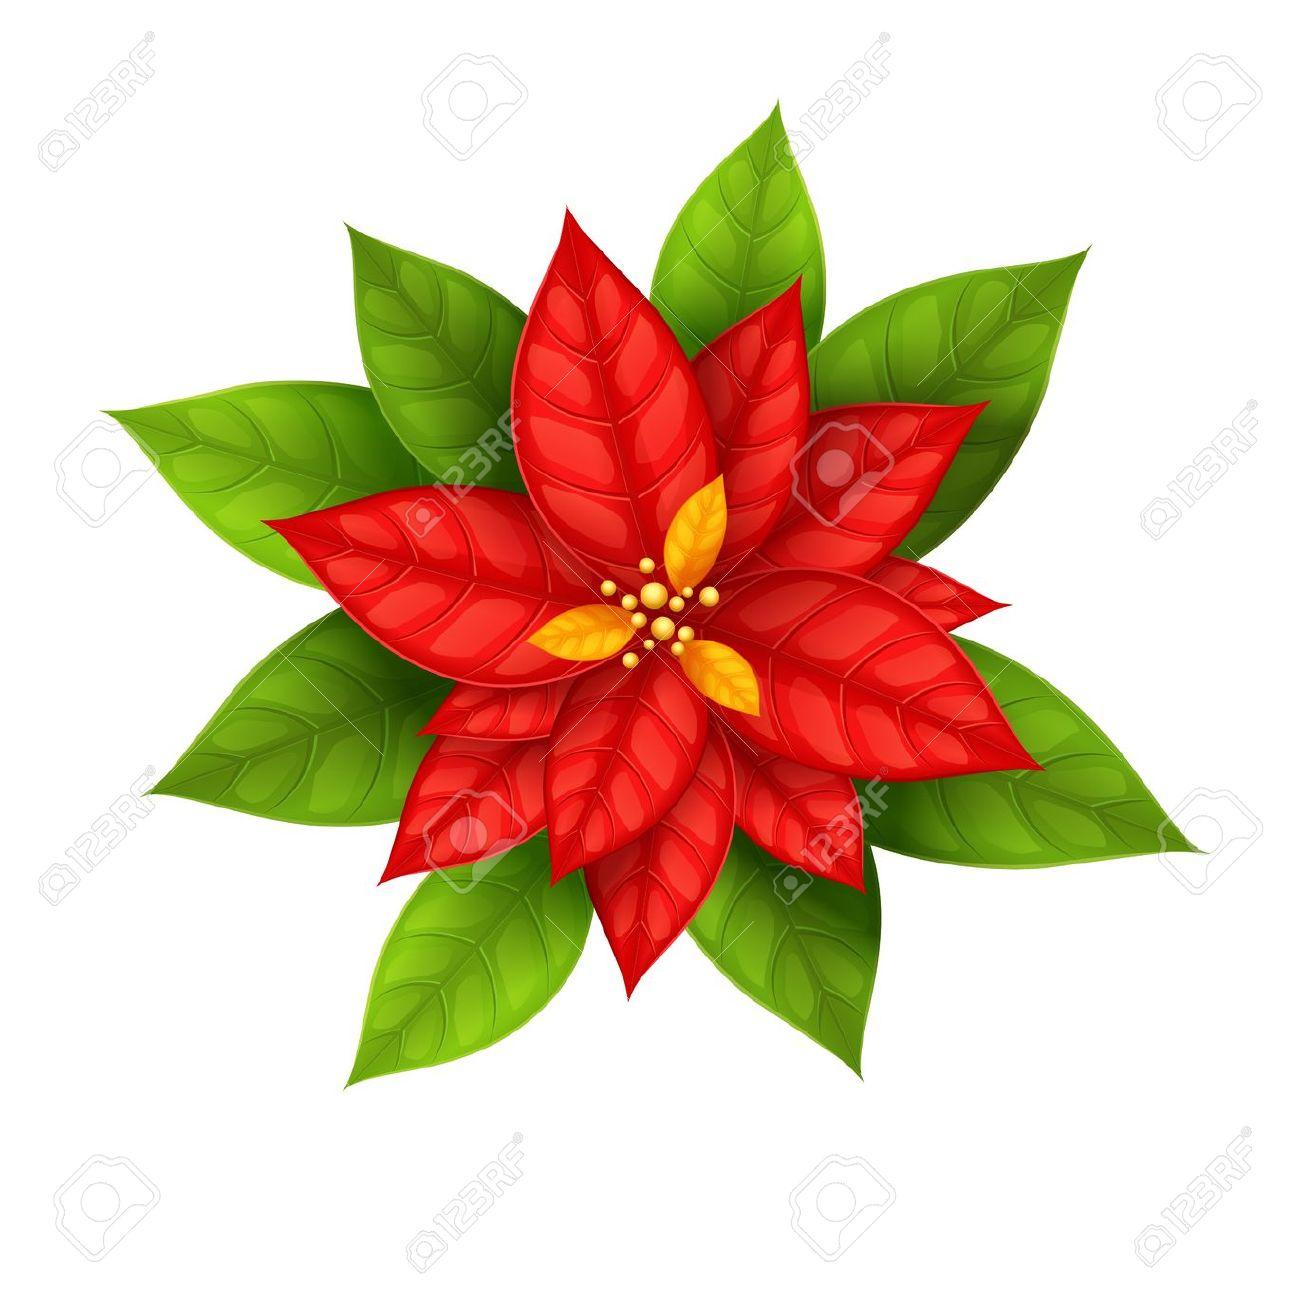 poinsettia: Red Christmas Star flower poinsettia isolated on white background - eps10 vector illustration